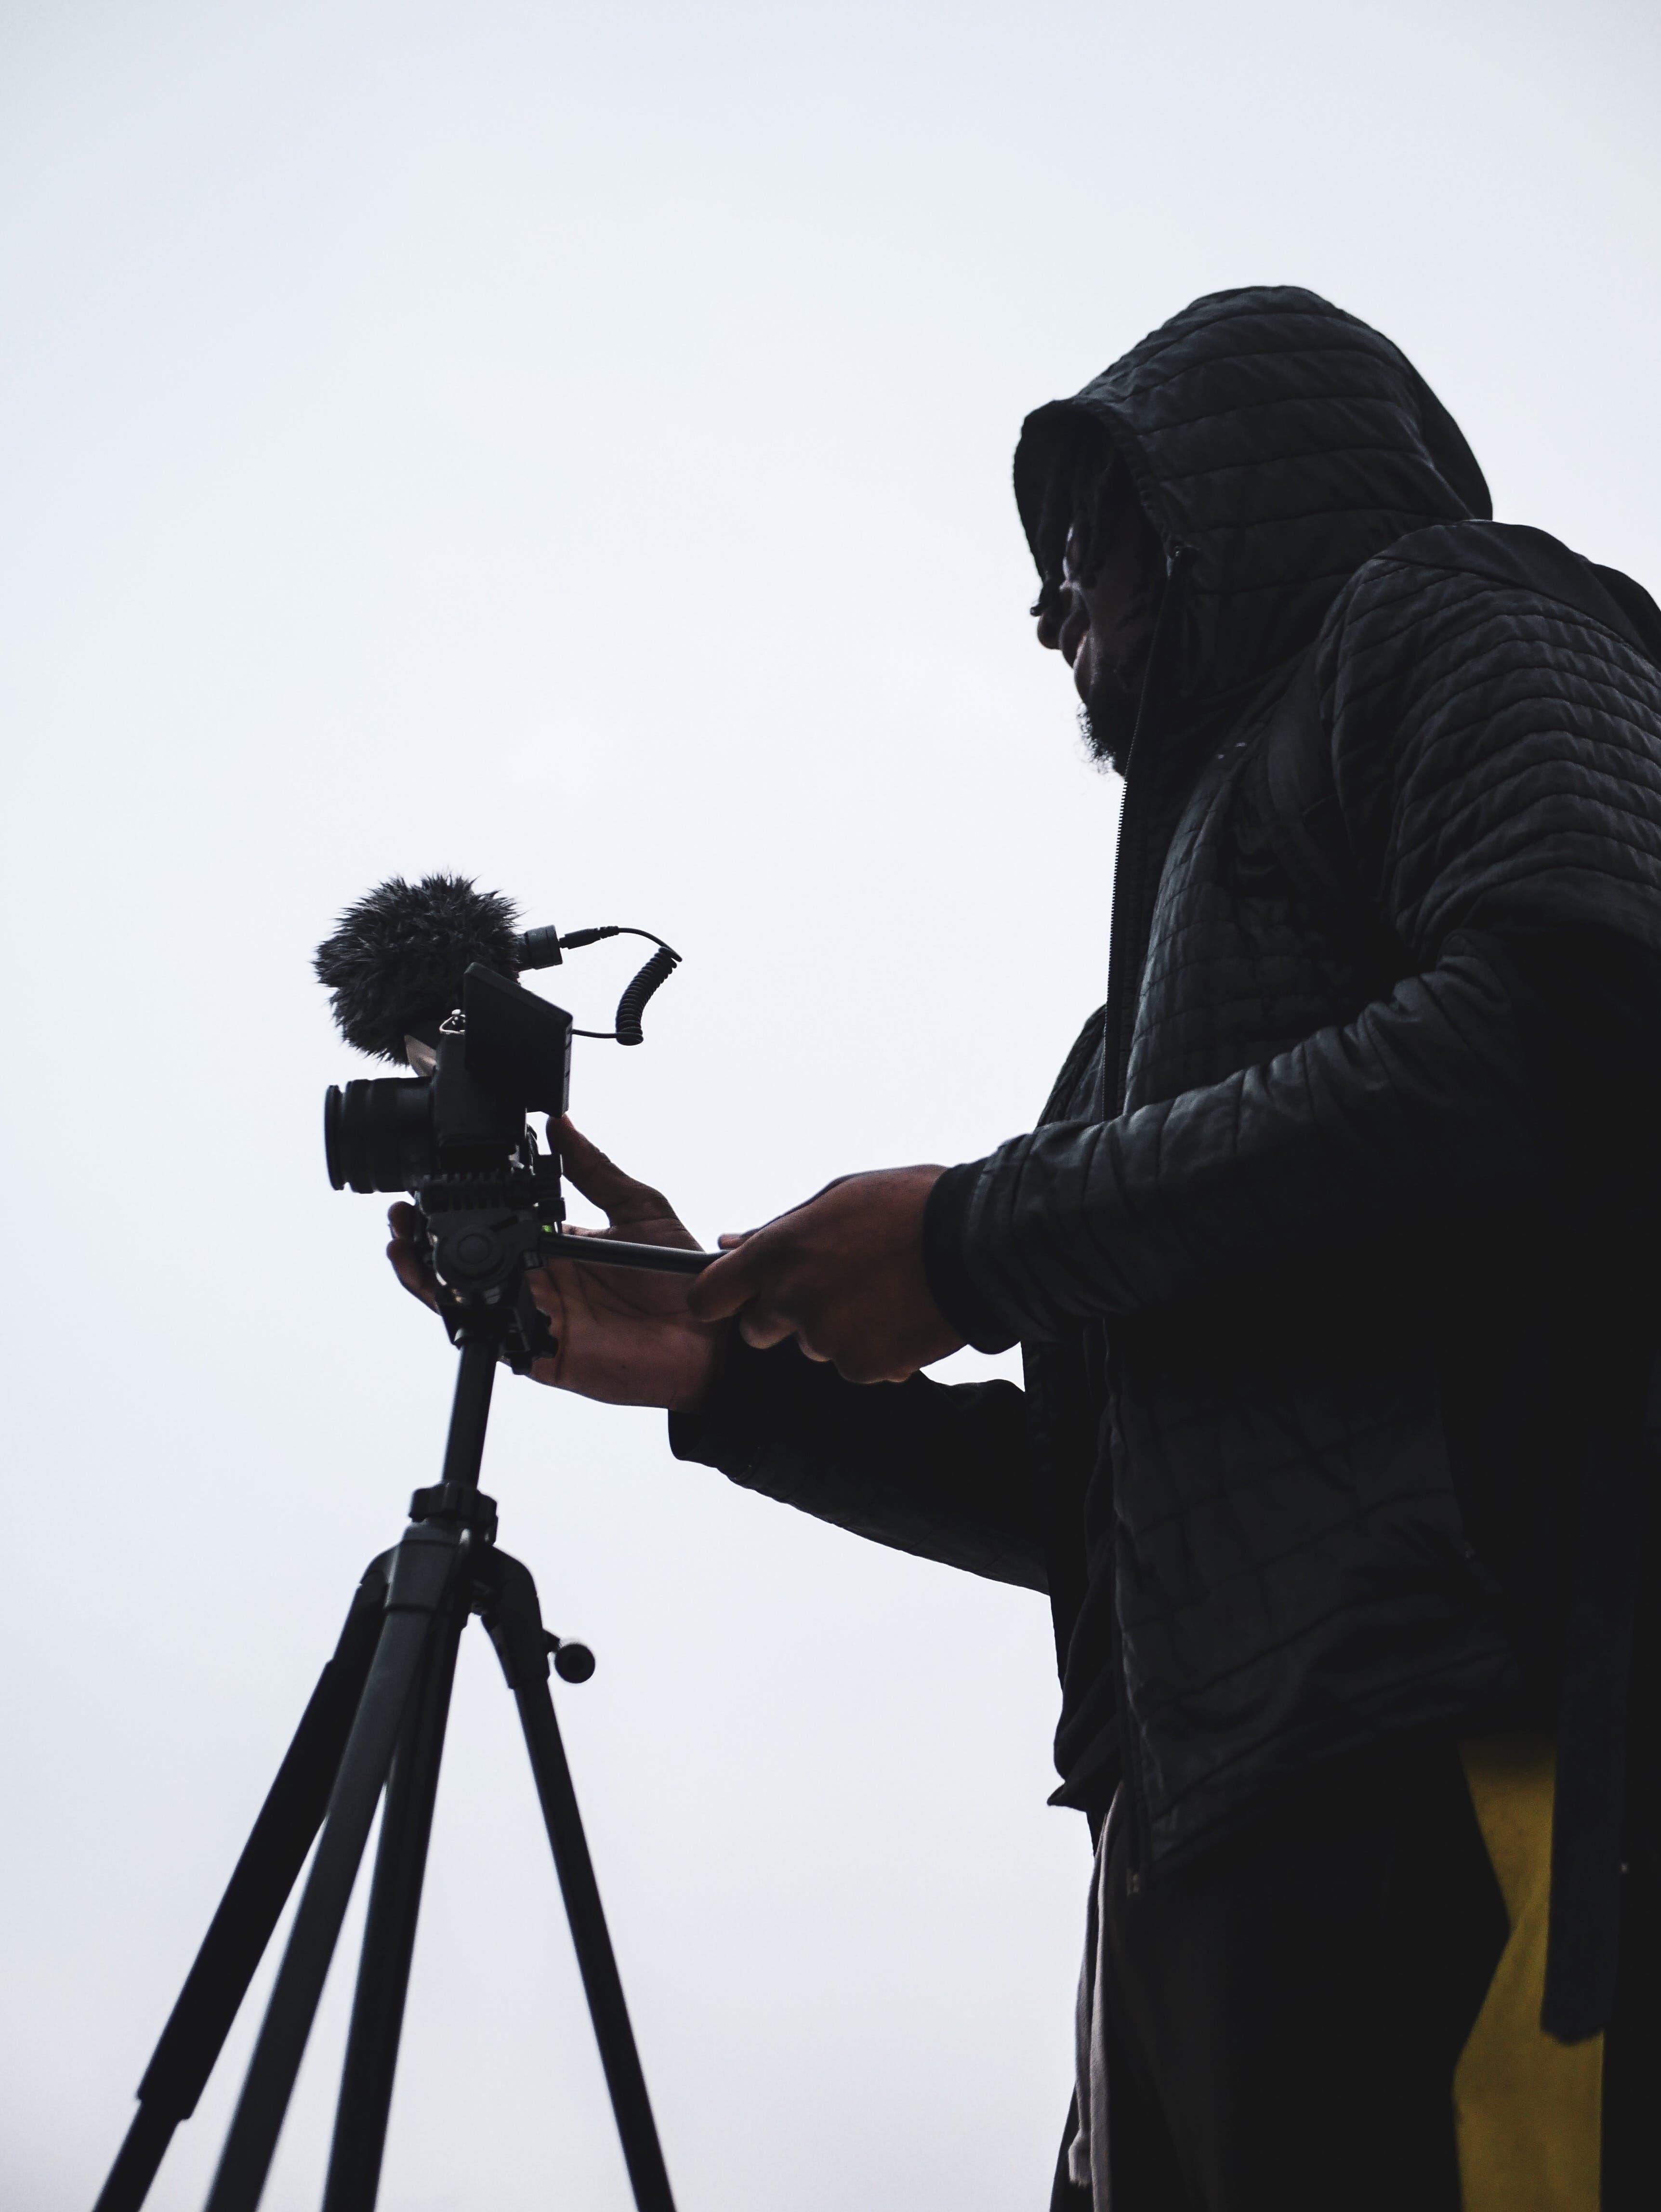 Person Holding Camera on Tripod